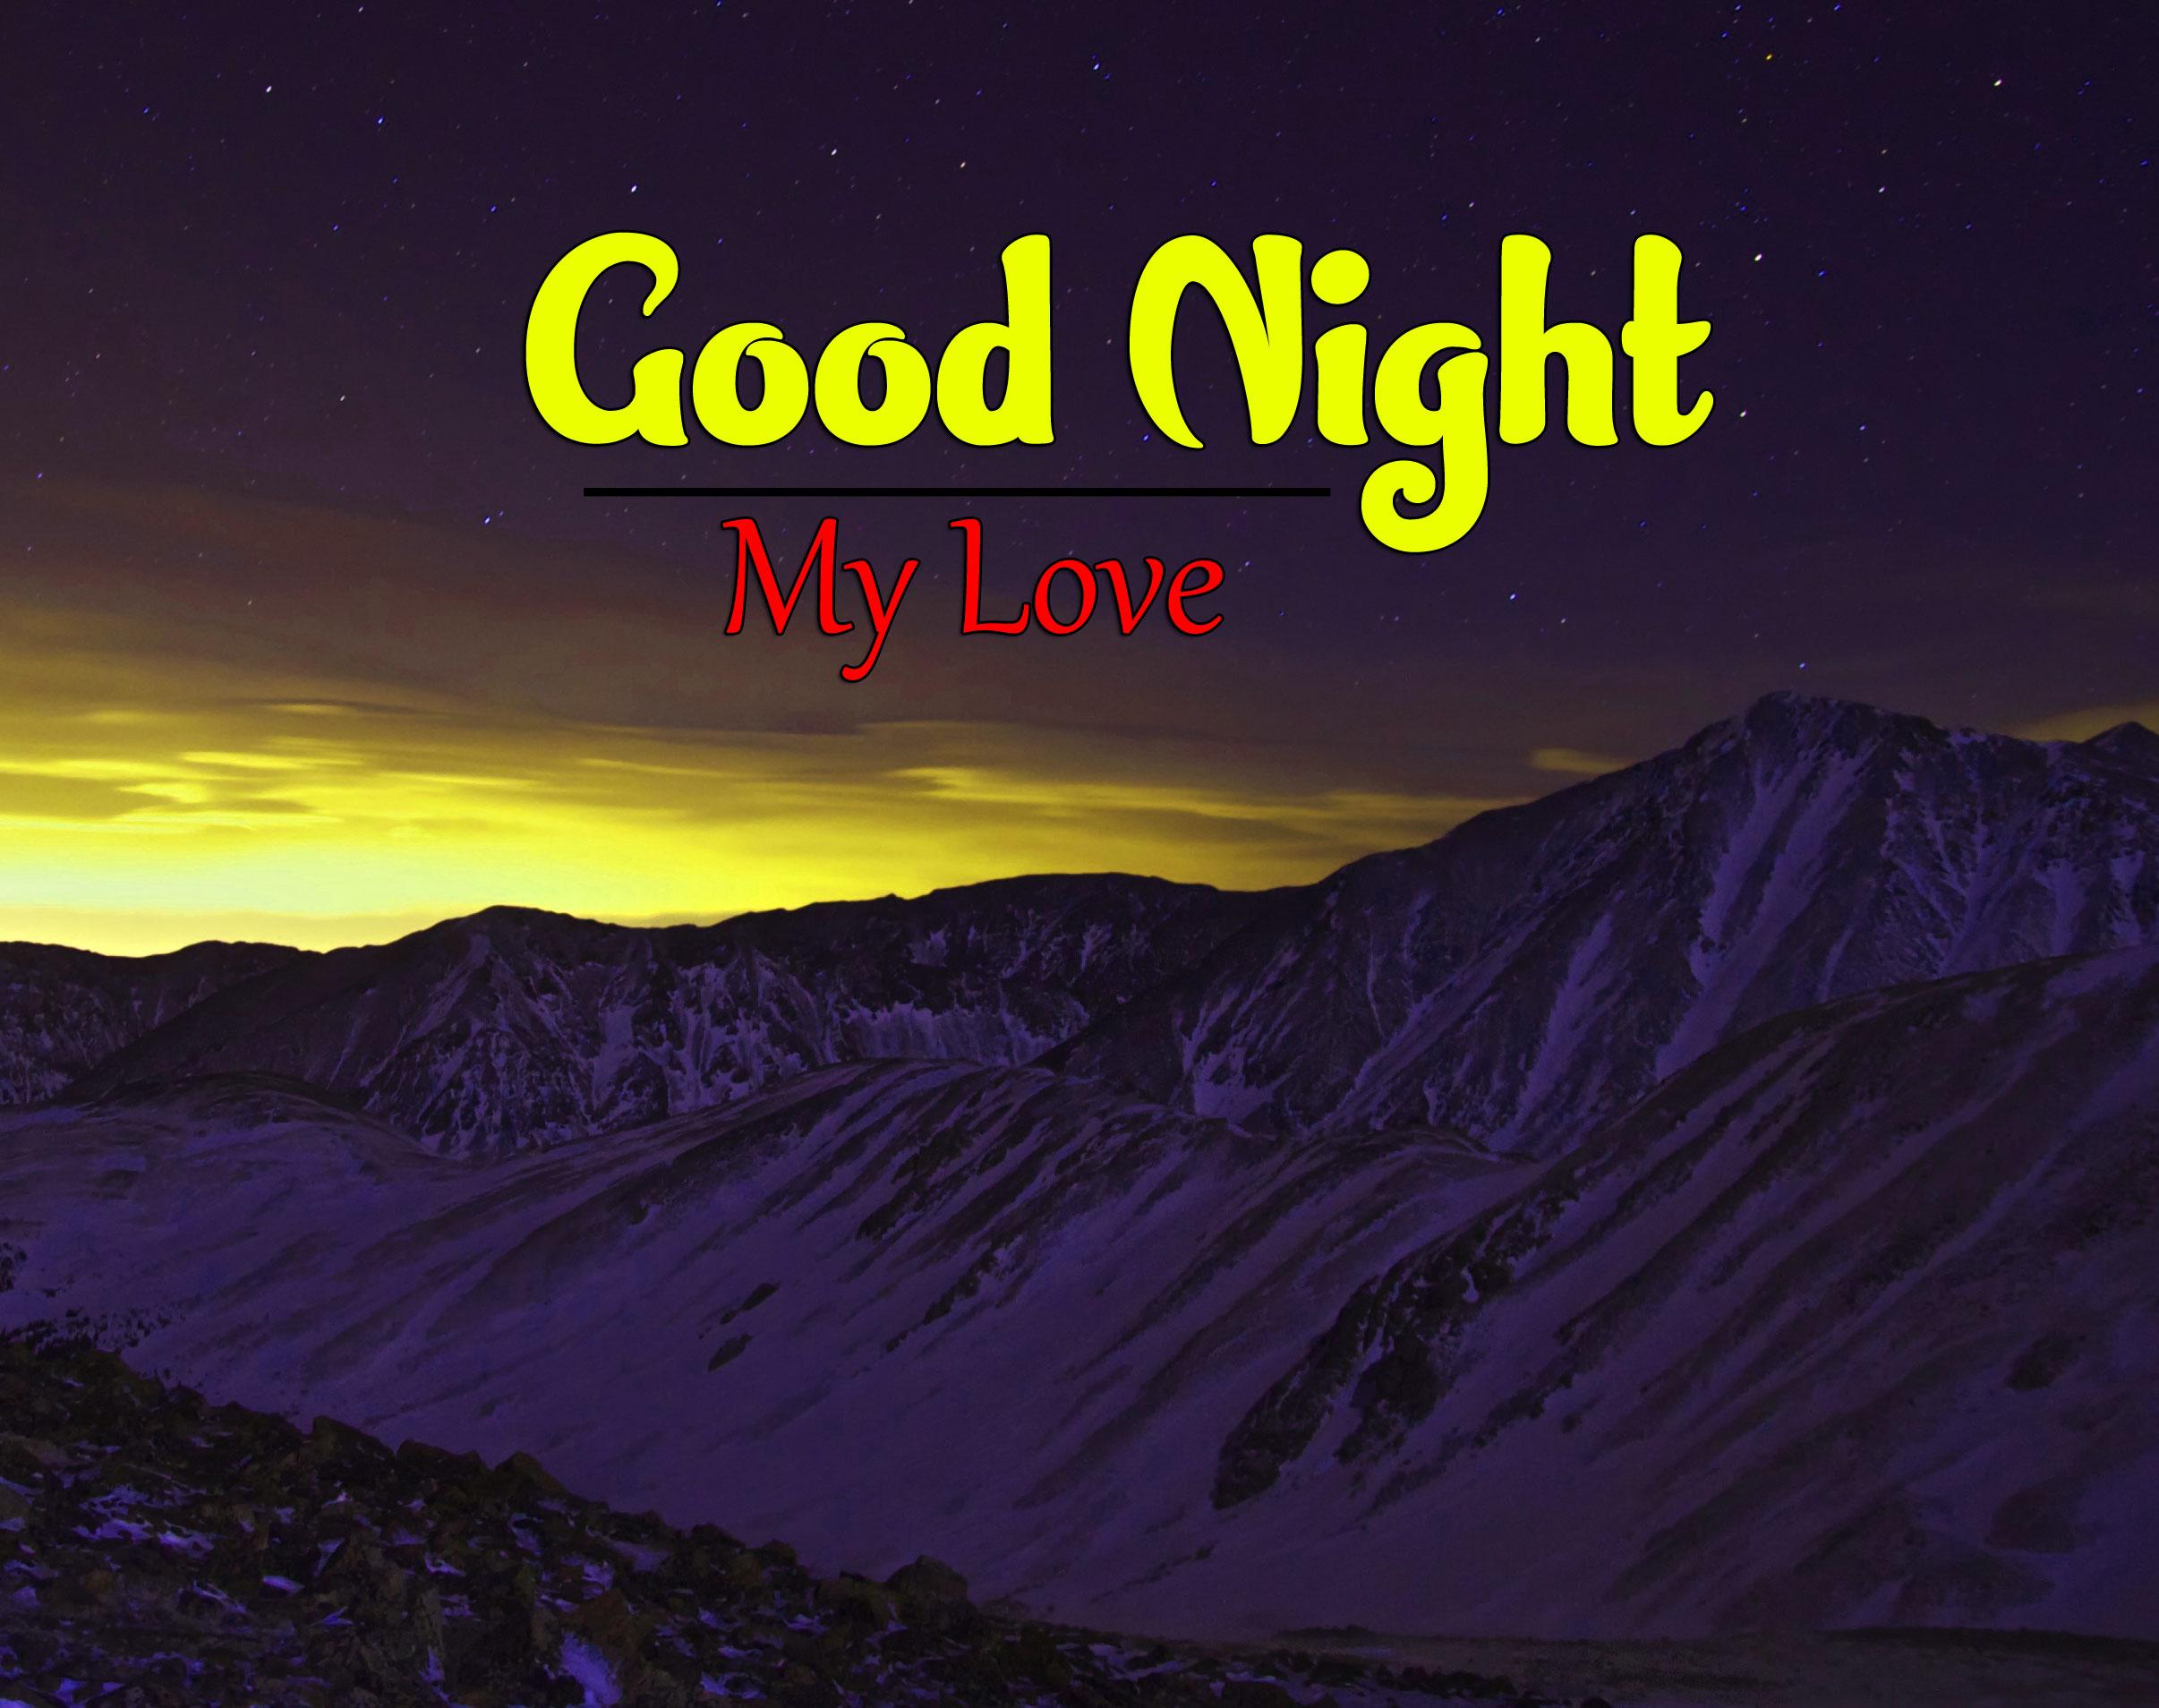 Good Night Images Pics In p